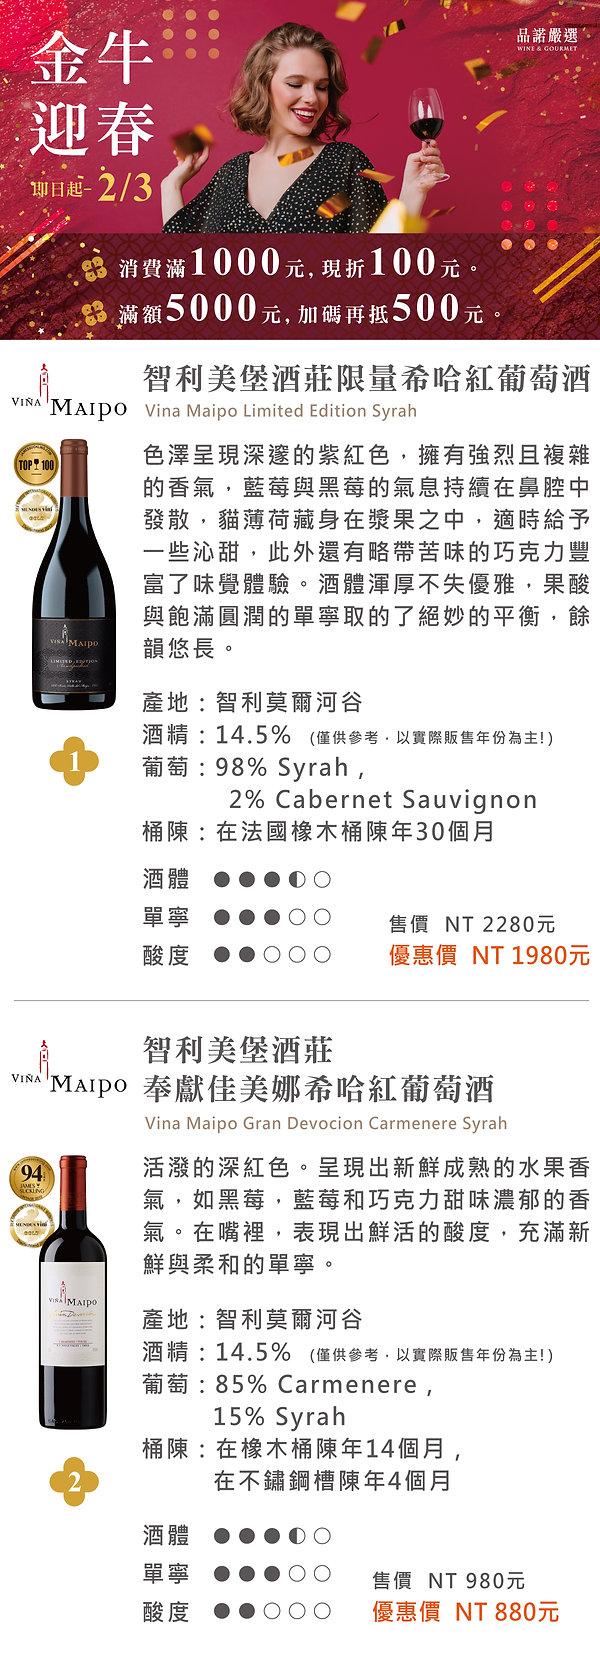 20210121-EDM-官網用-W1200-1.jpg